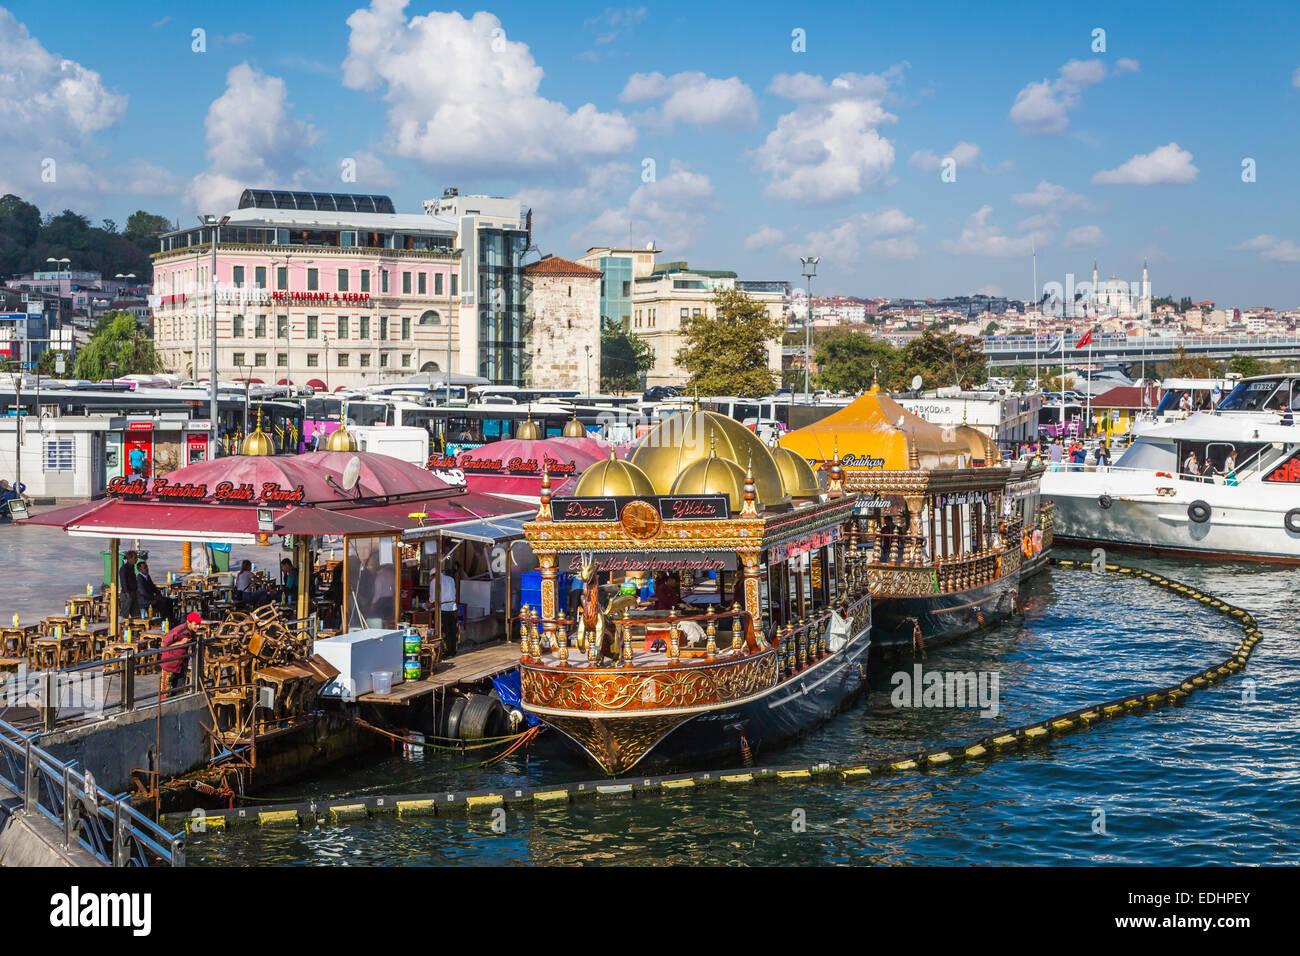 Eminonu Pier floating fish restaurants at the foot of the Galata Bridge in Istanbul, Turkey, Eurasia. - Stock Image